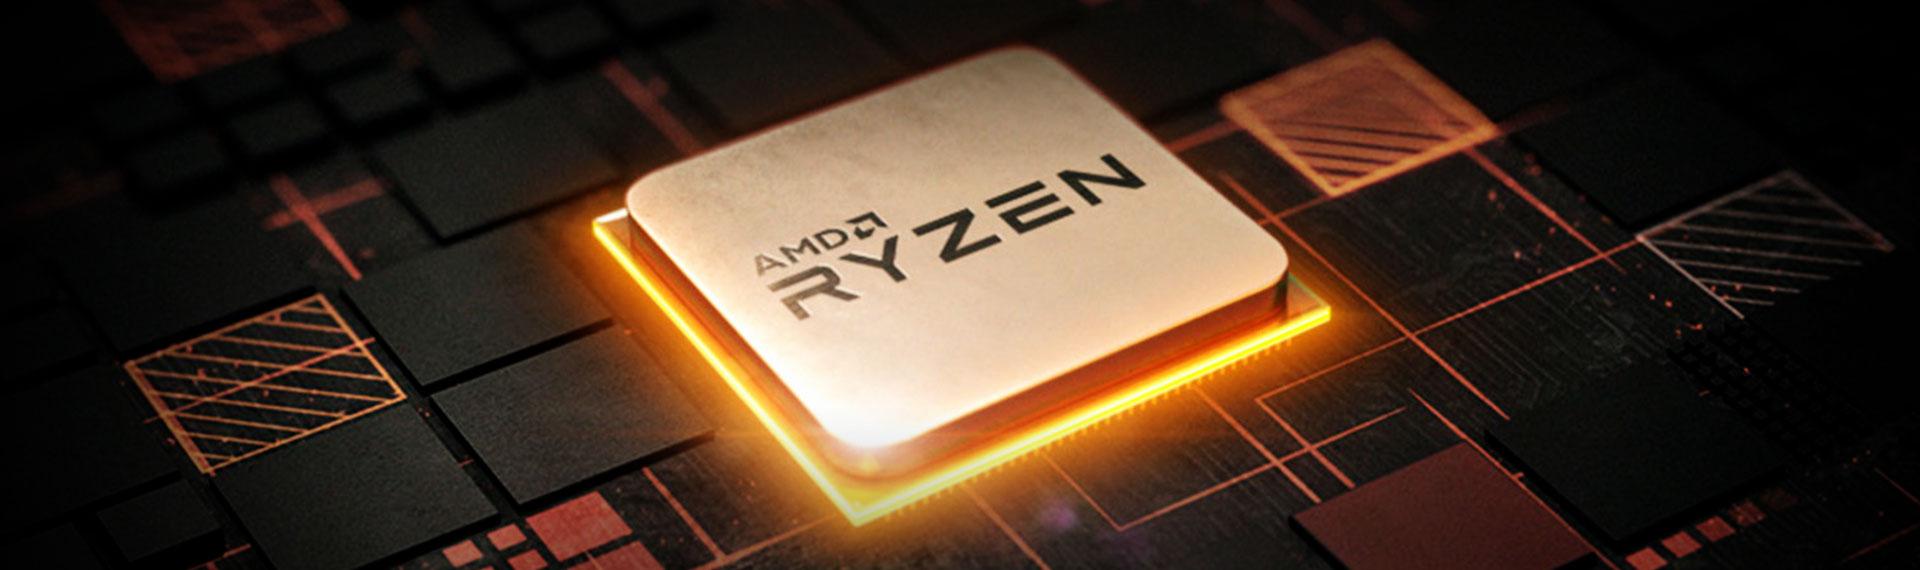 Seberapa Hebat Performa Laptop AMD Ryzen? Ini Penjelasannya!